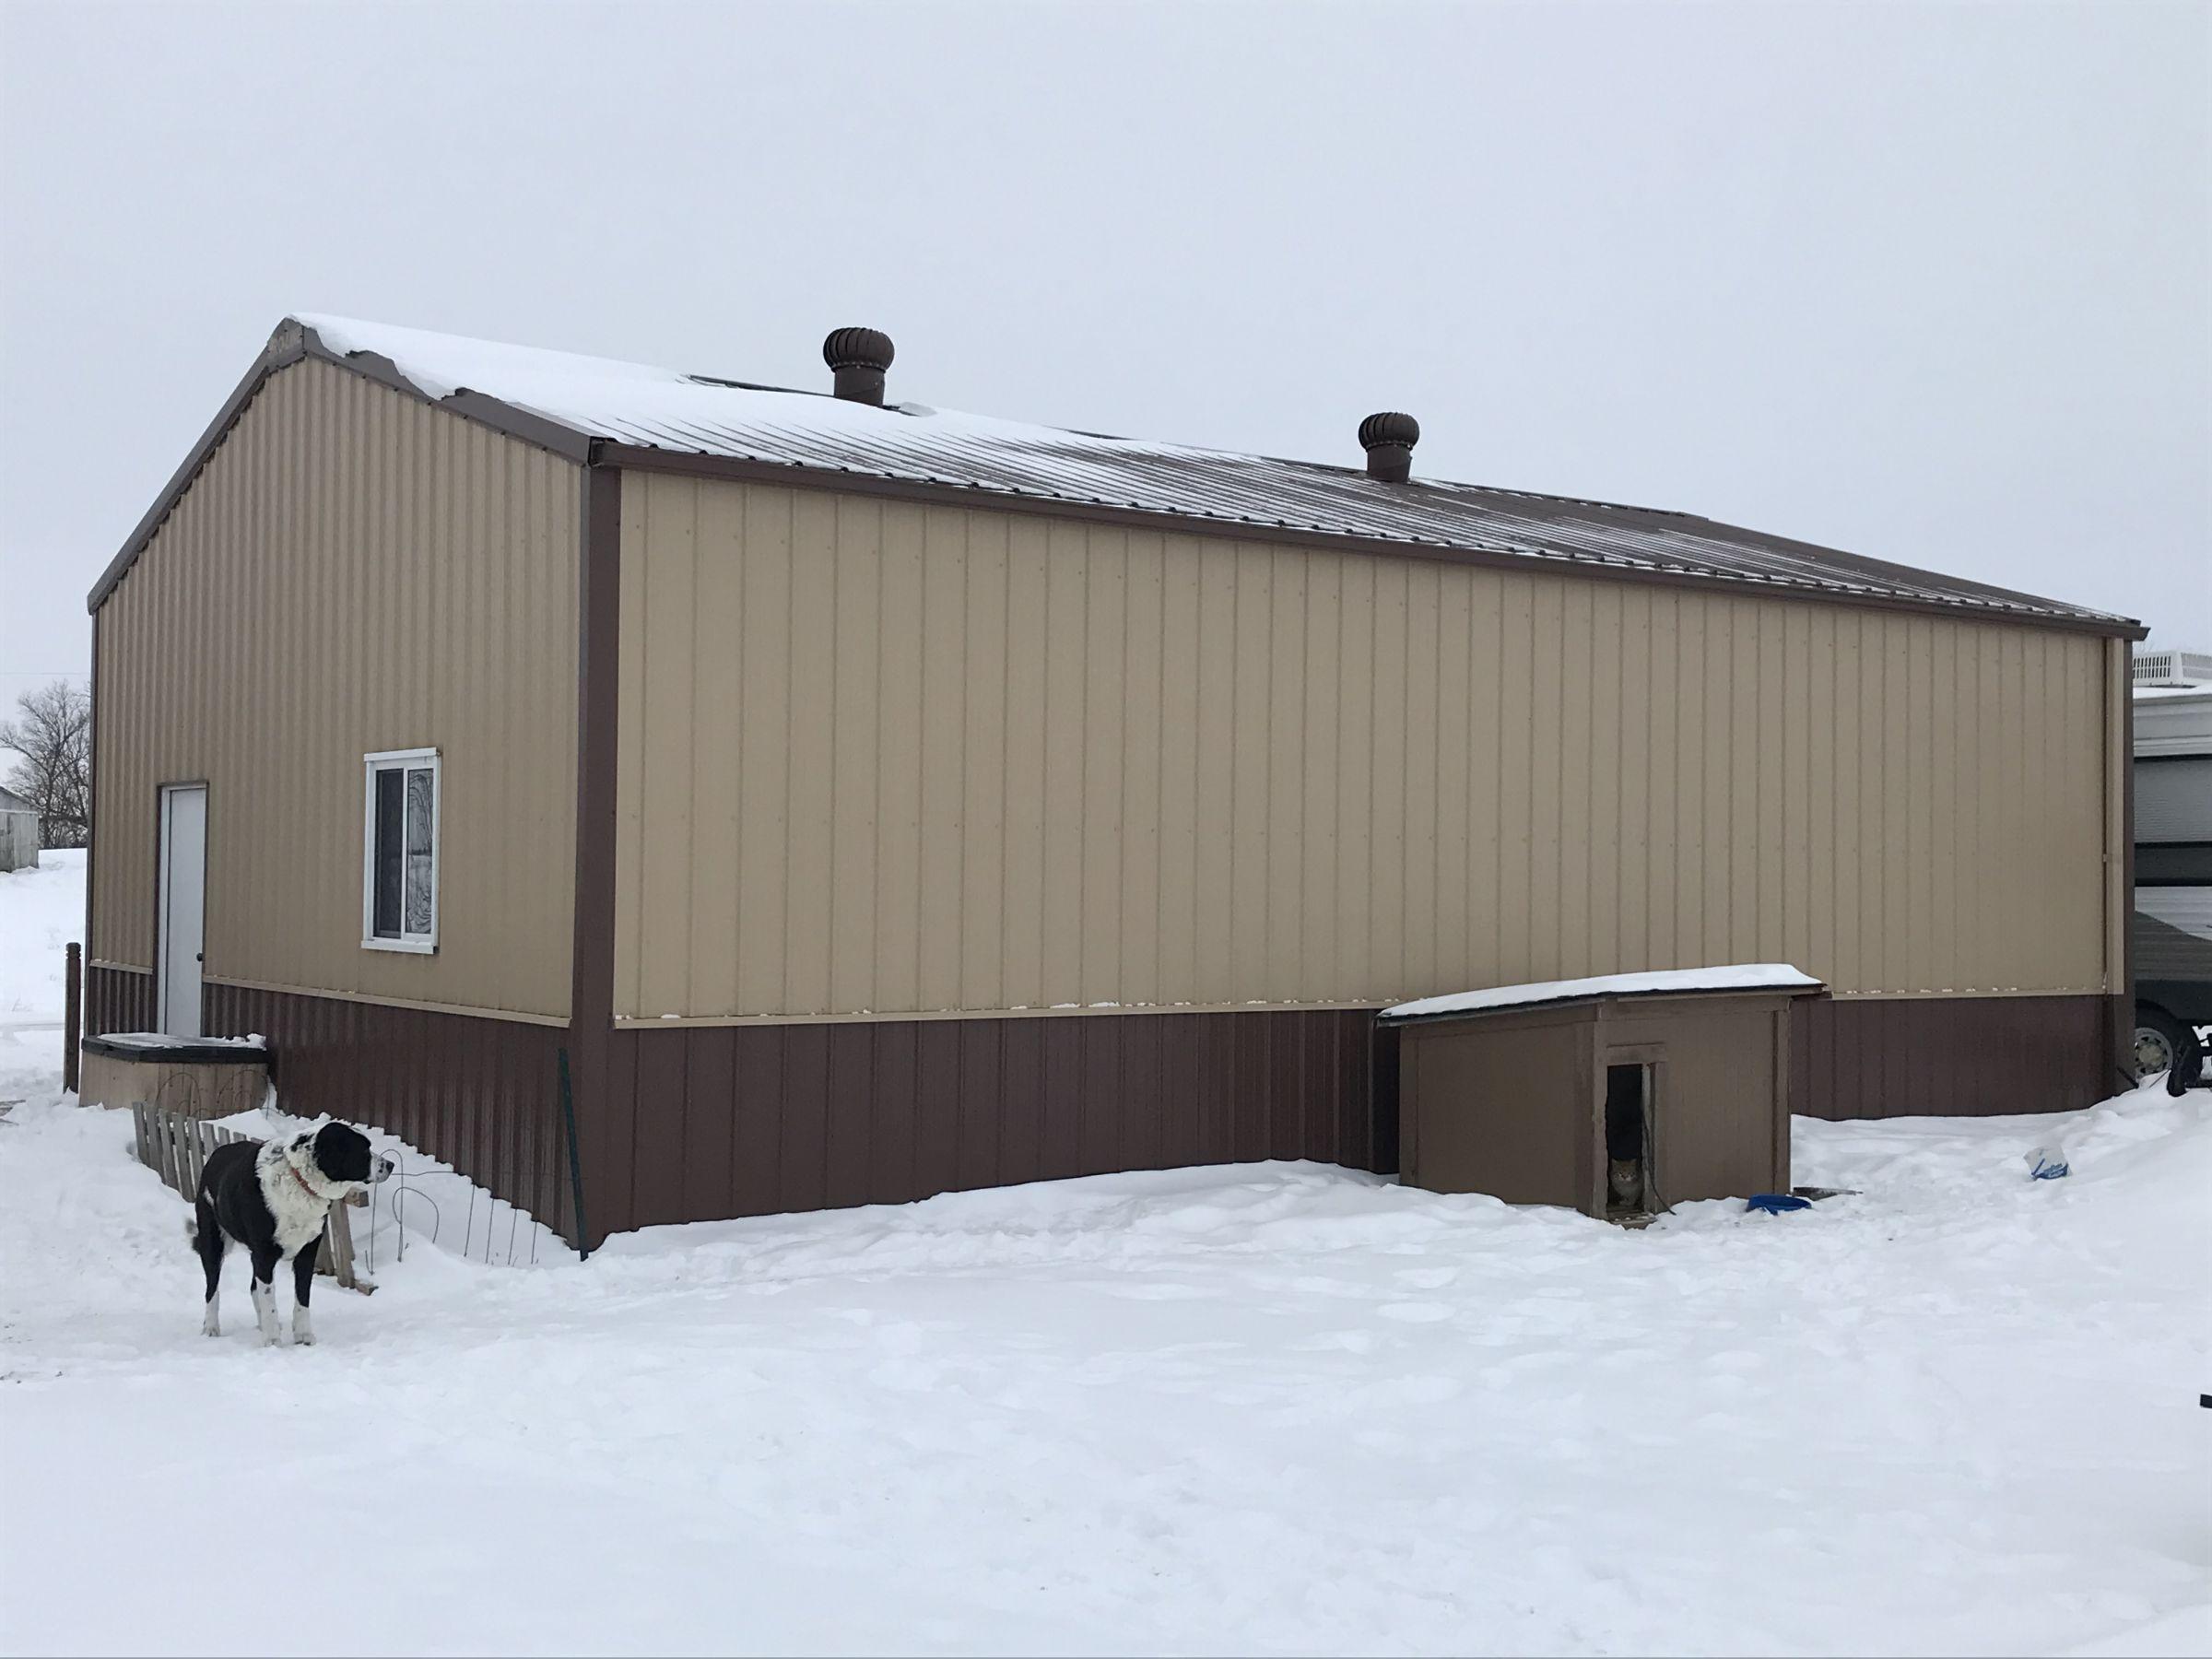 residential-warren-county-iowa-7-acres-listing-number-15327-1-2021-02-17-135839.JPG